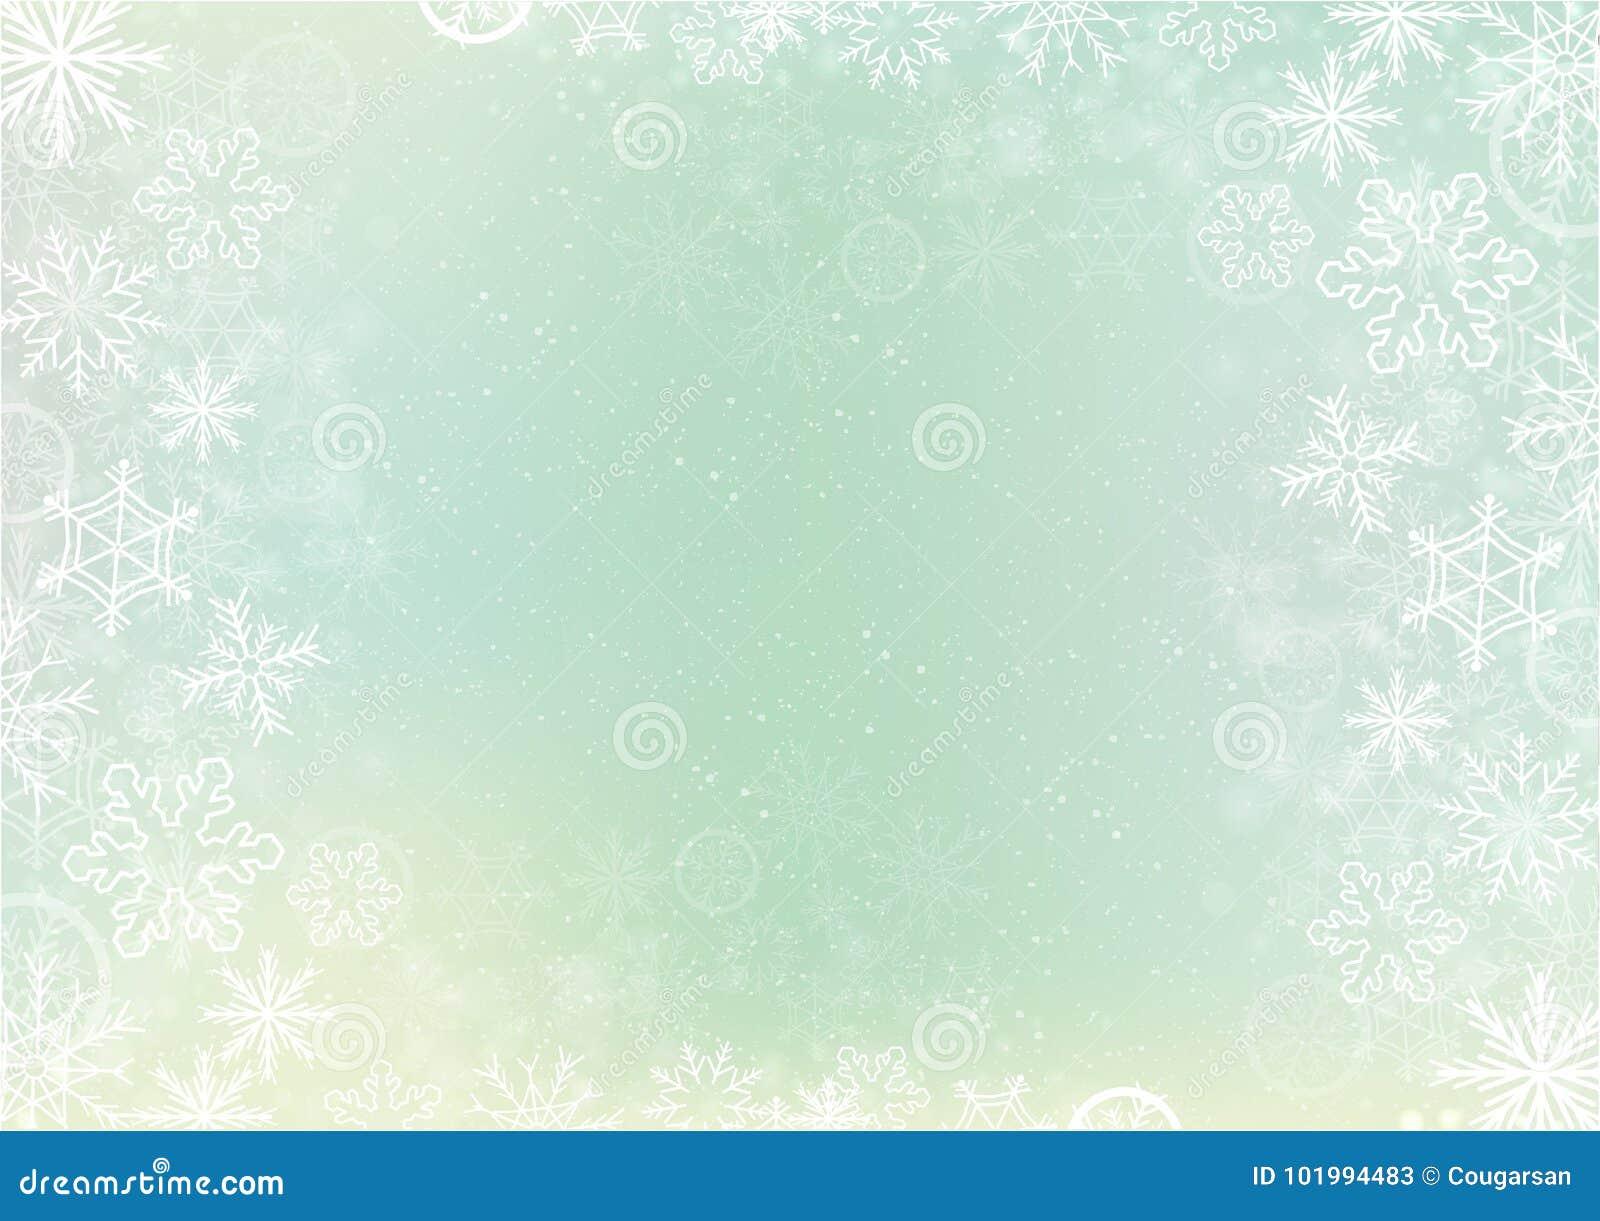 green elegant winter background with snowflake border